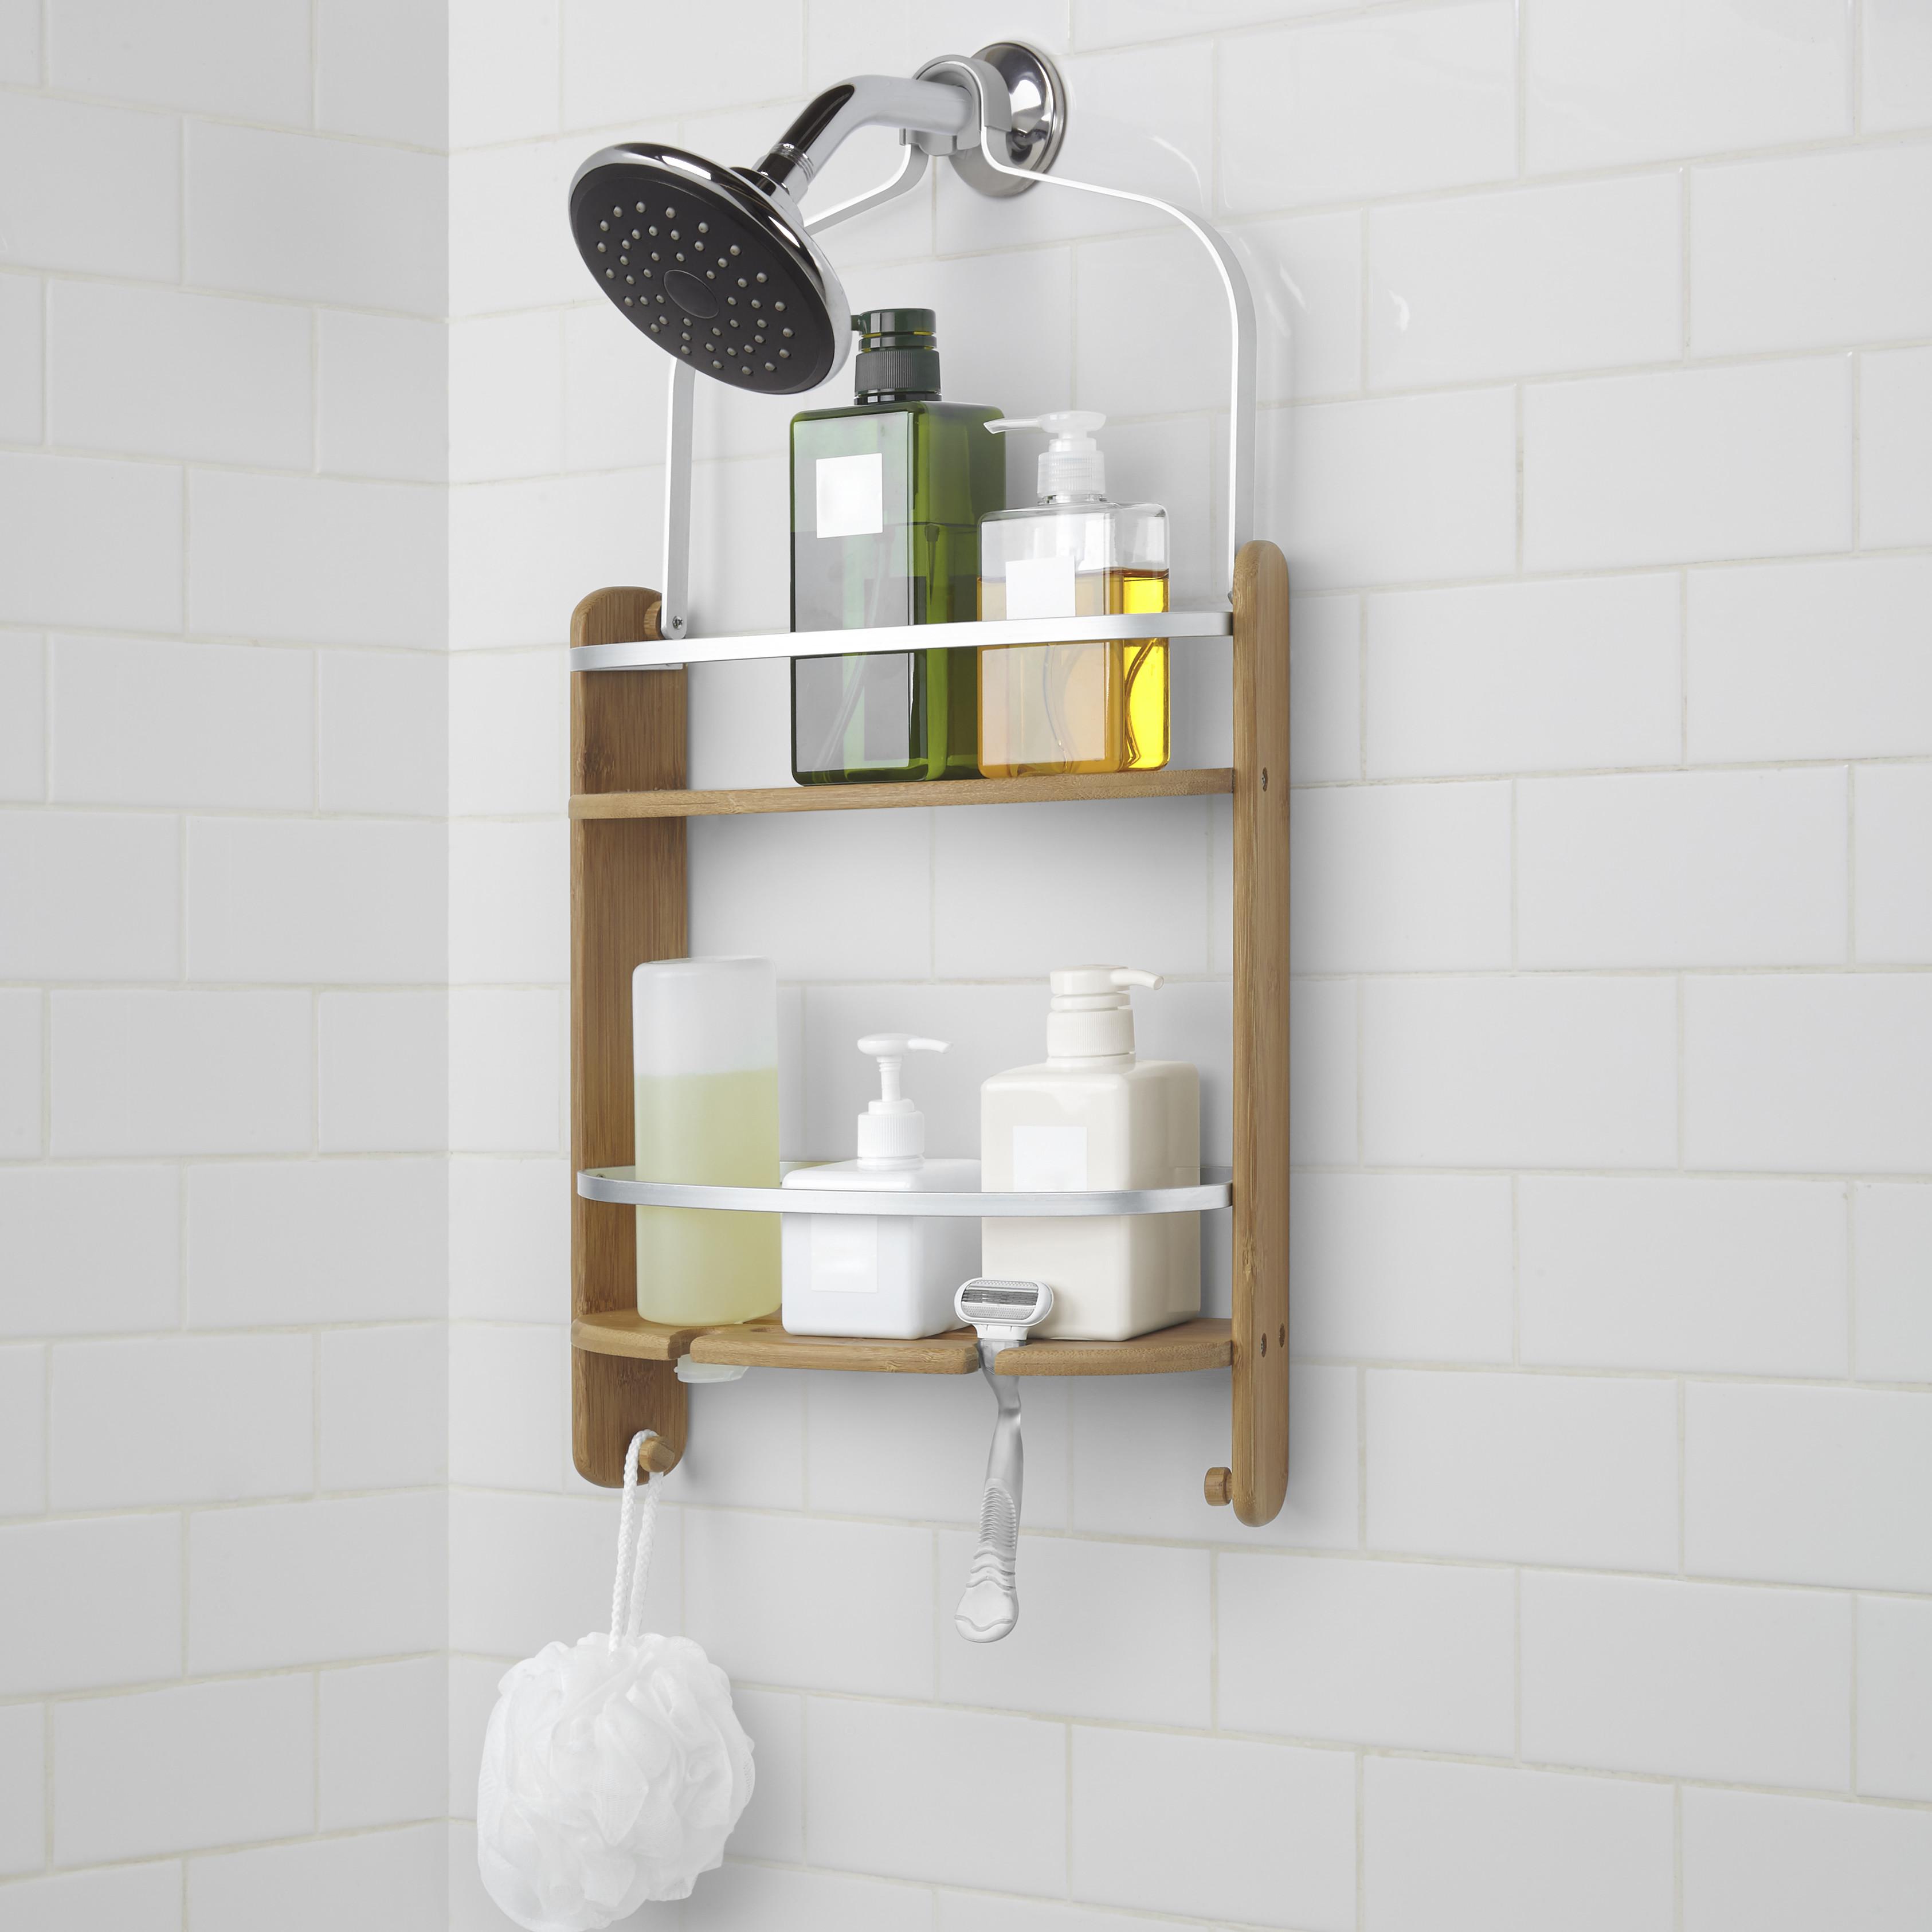 Umbra-Barrel-Wood-Hanging-Shower-Caddy (1) - Jamie Gold Kitchen and ...